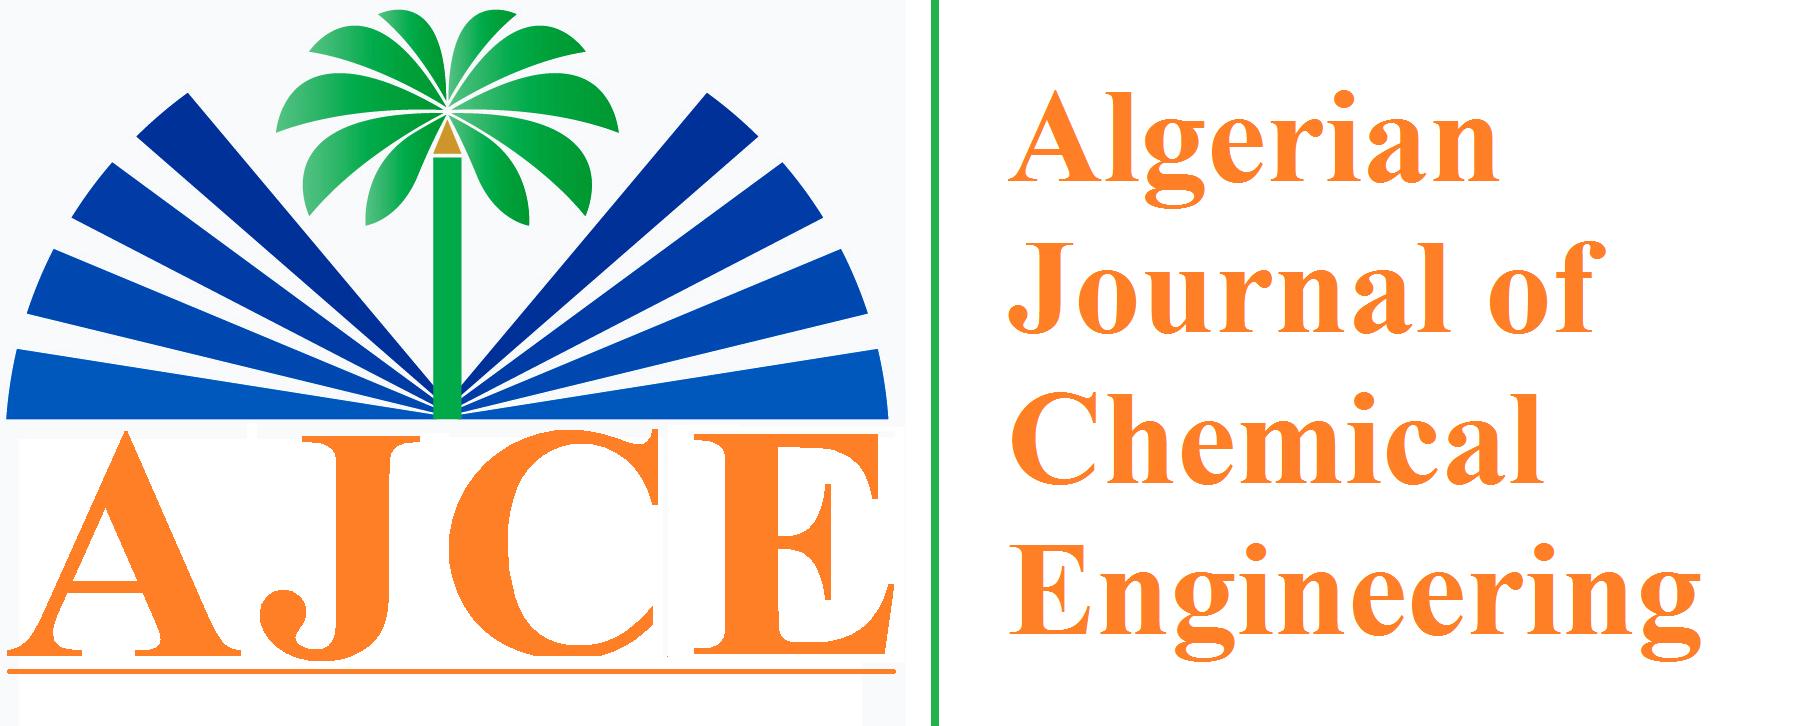 Algerian Journal of Chemical Engineering